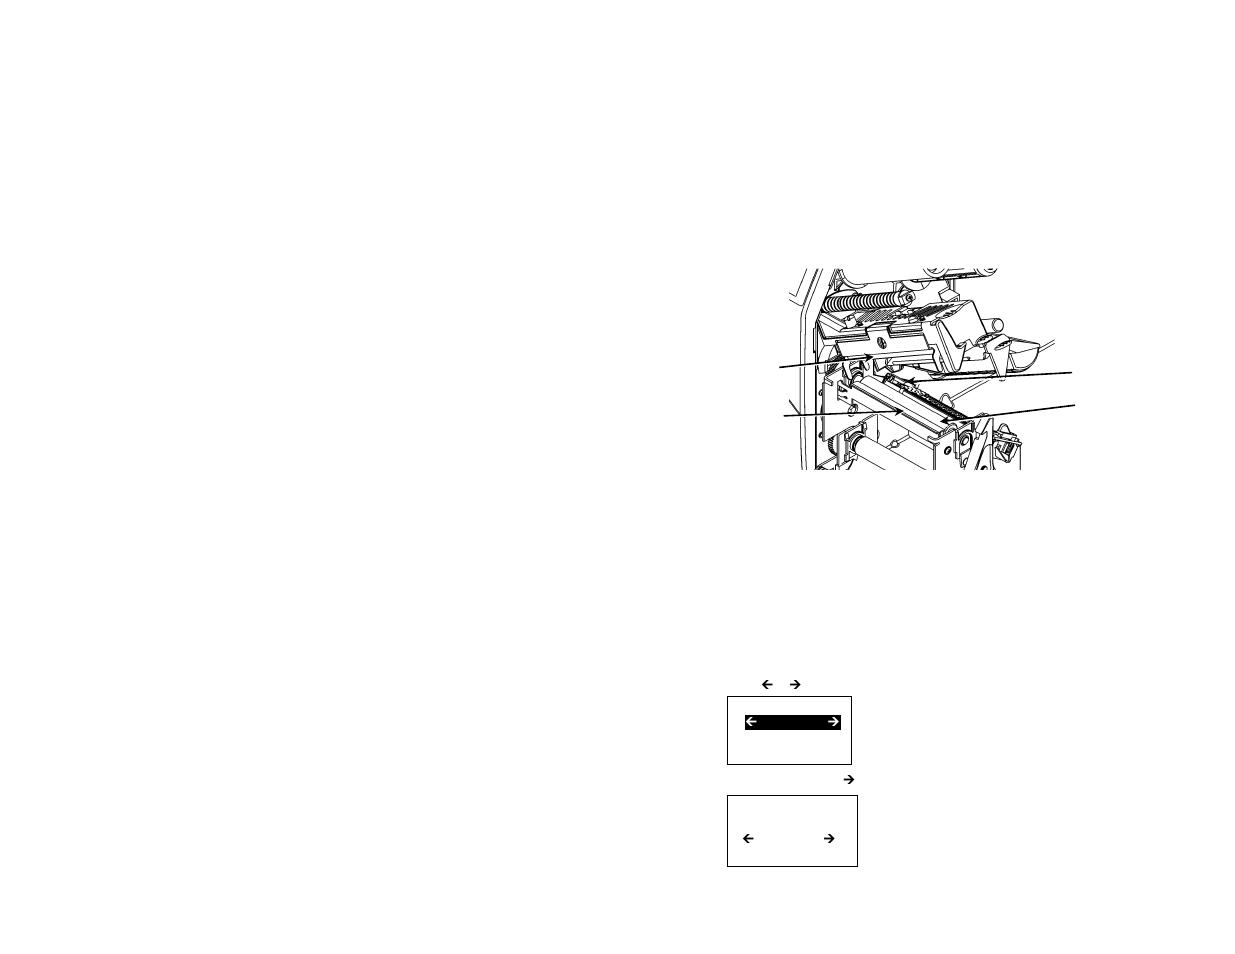 limpieza selecci n del int rprete avery dennison monarch 9906 rh manualsdir com Operators Manual Owner's Manual